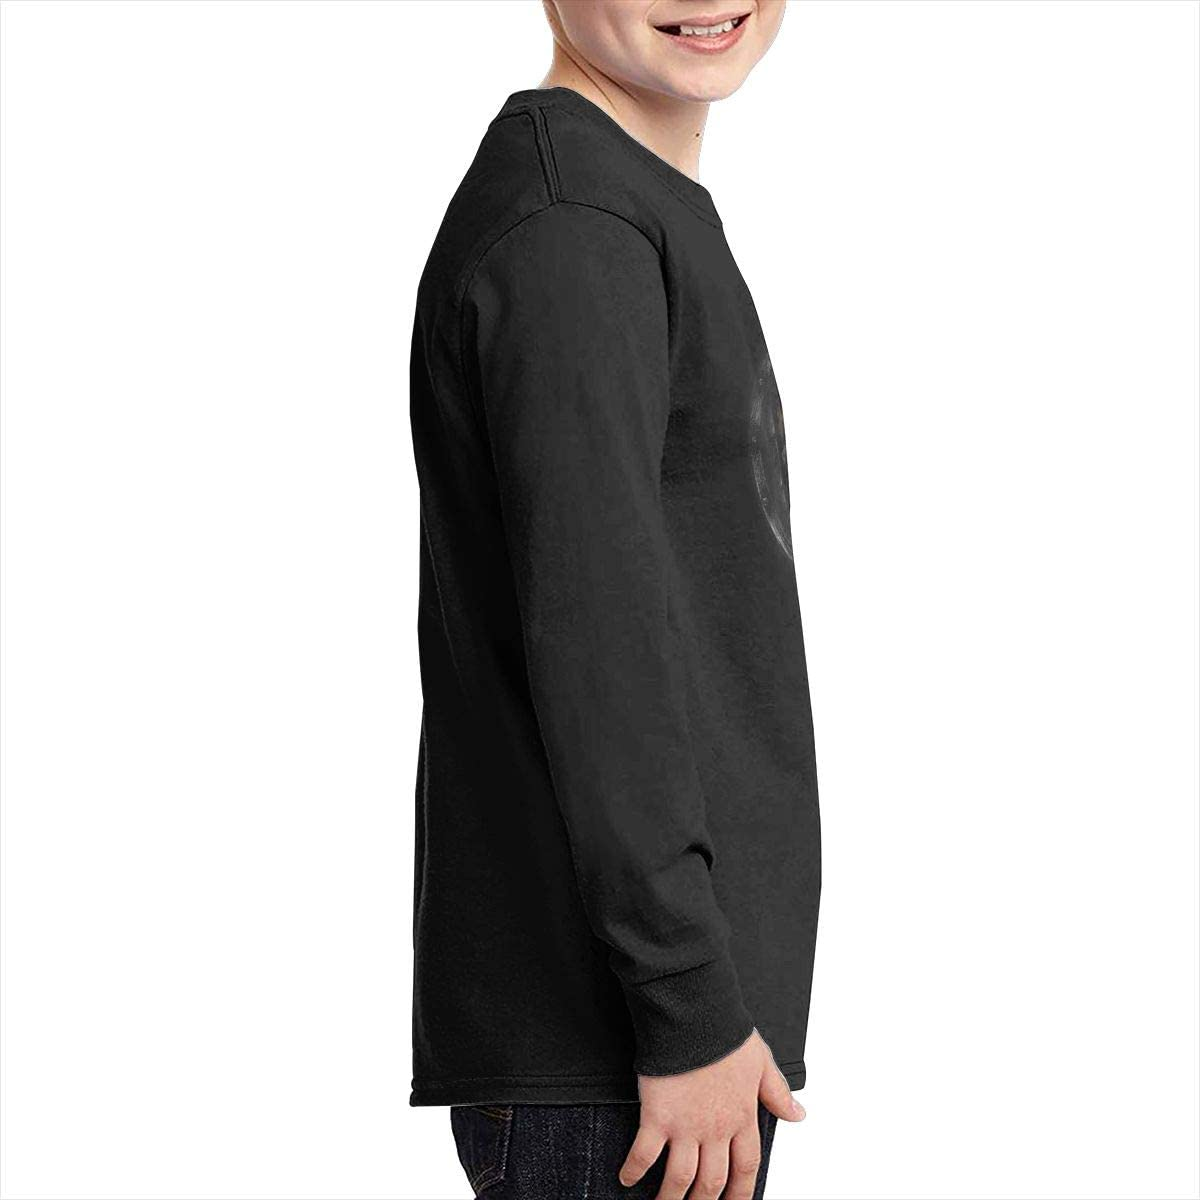 Howl/â/€s Moving Heart Boys Long Sleeve T-Shirt,Fashion Youth Tops